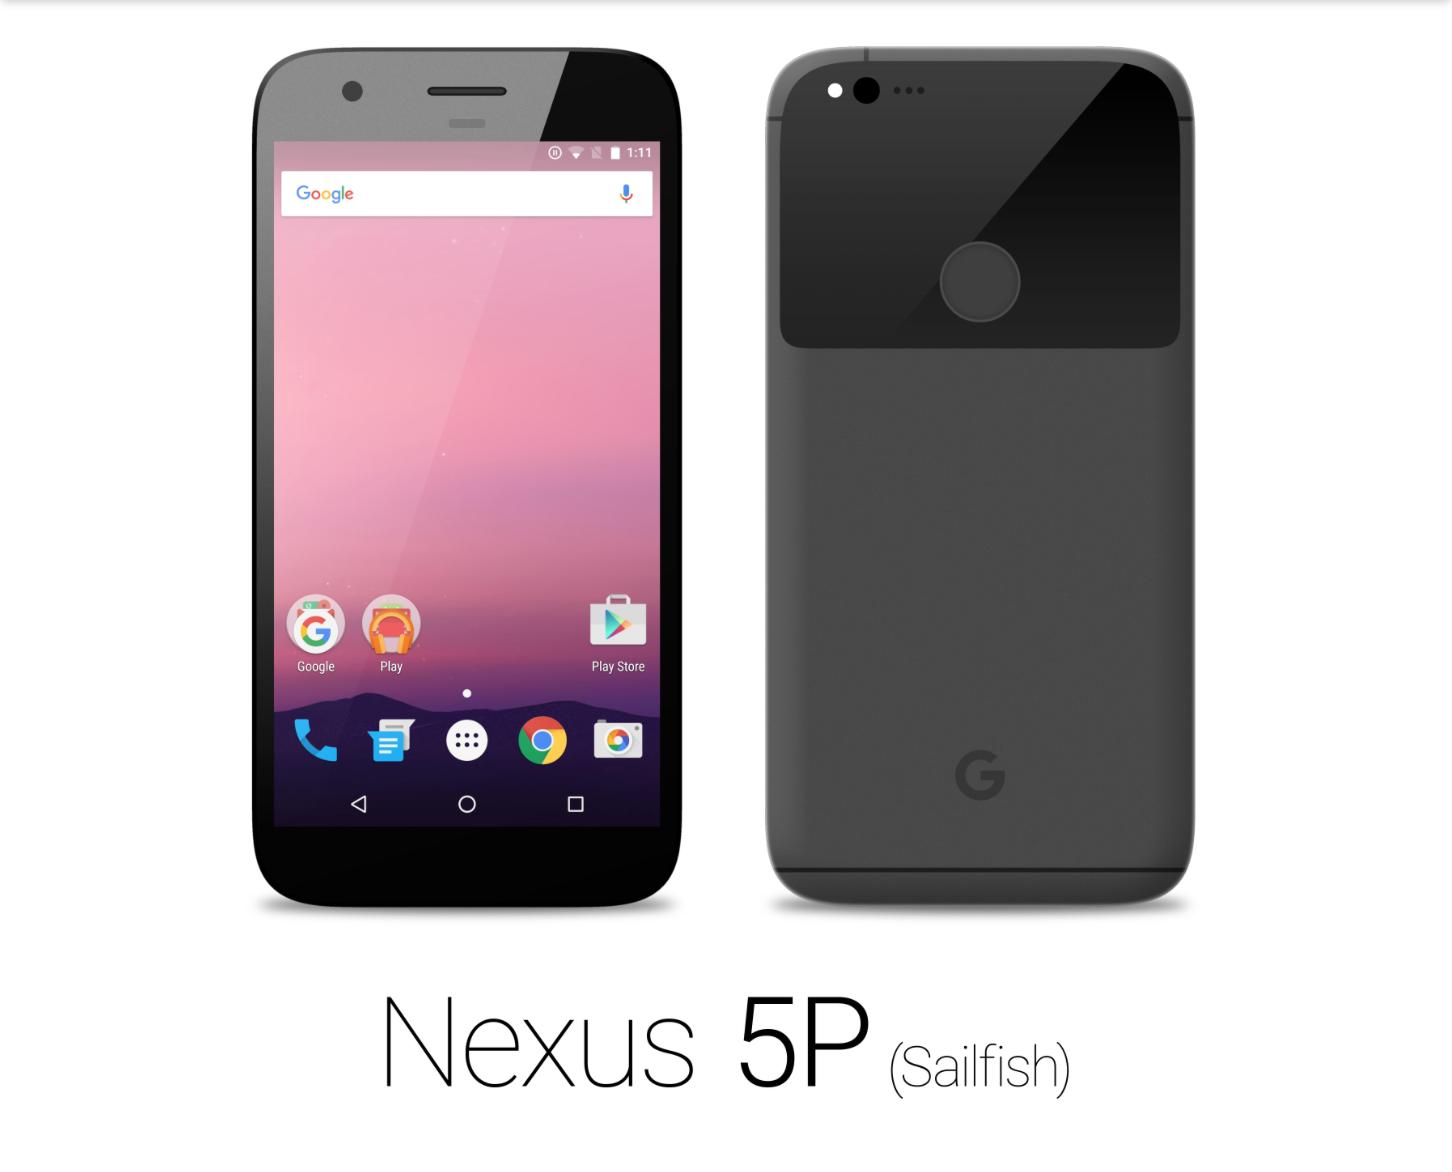 Google Nexus 5P